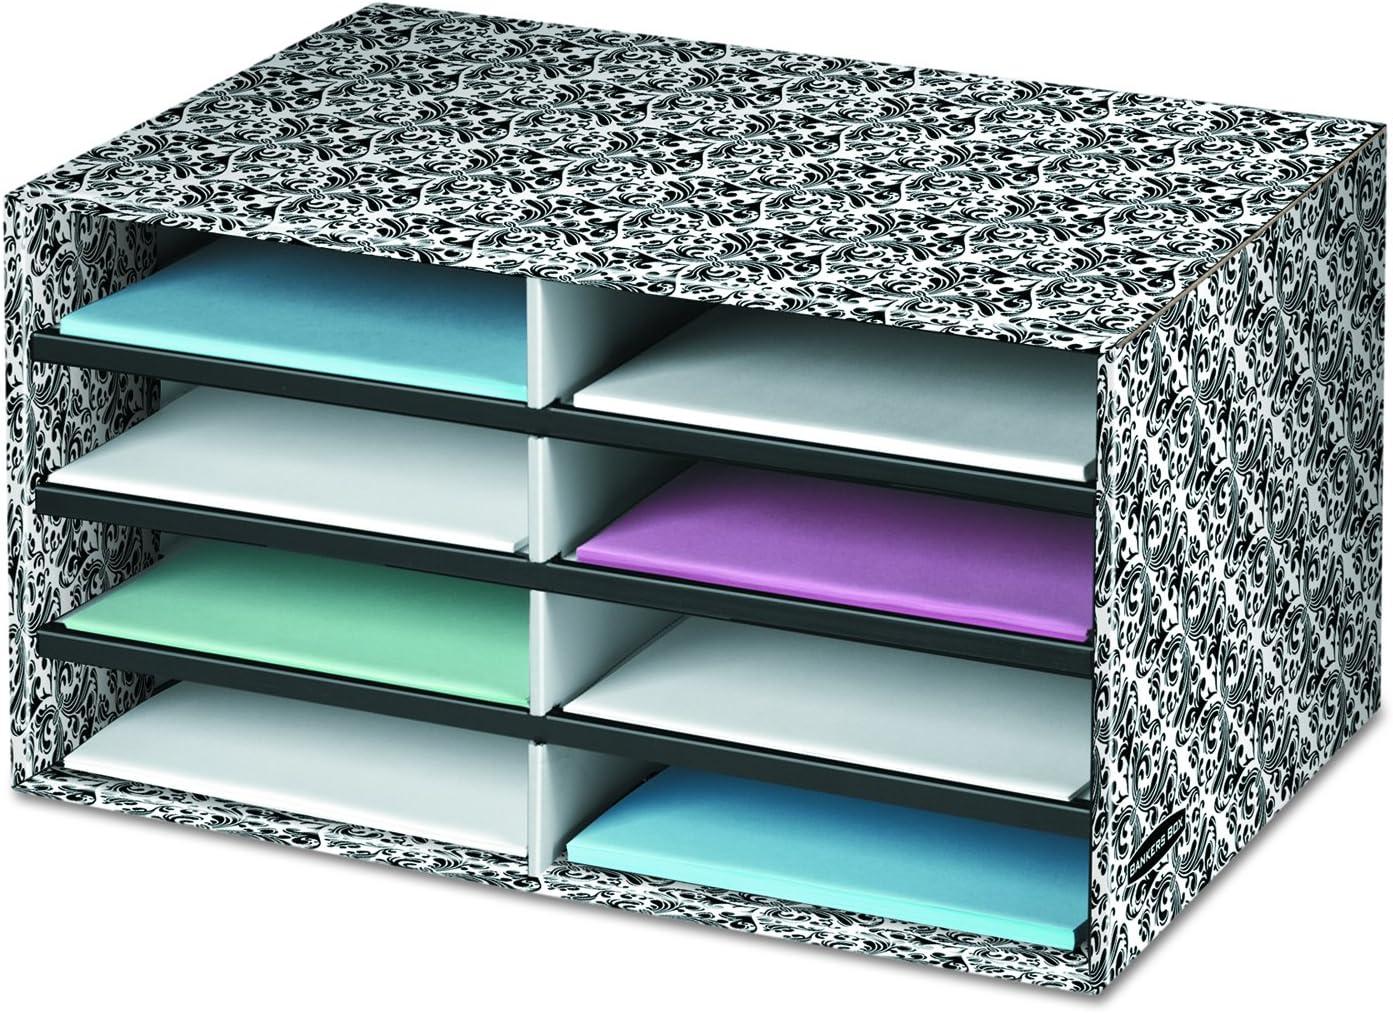 5. Bankers Box Decorative Eight Compartment Literature Sorter